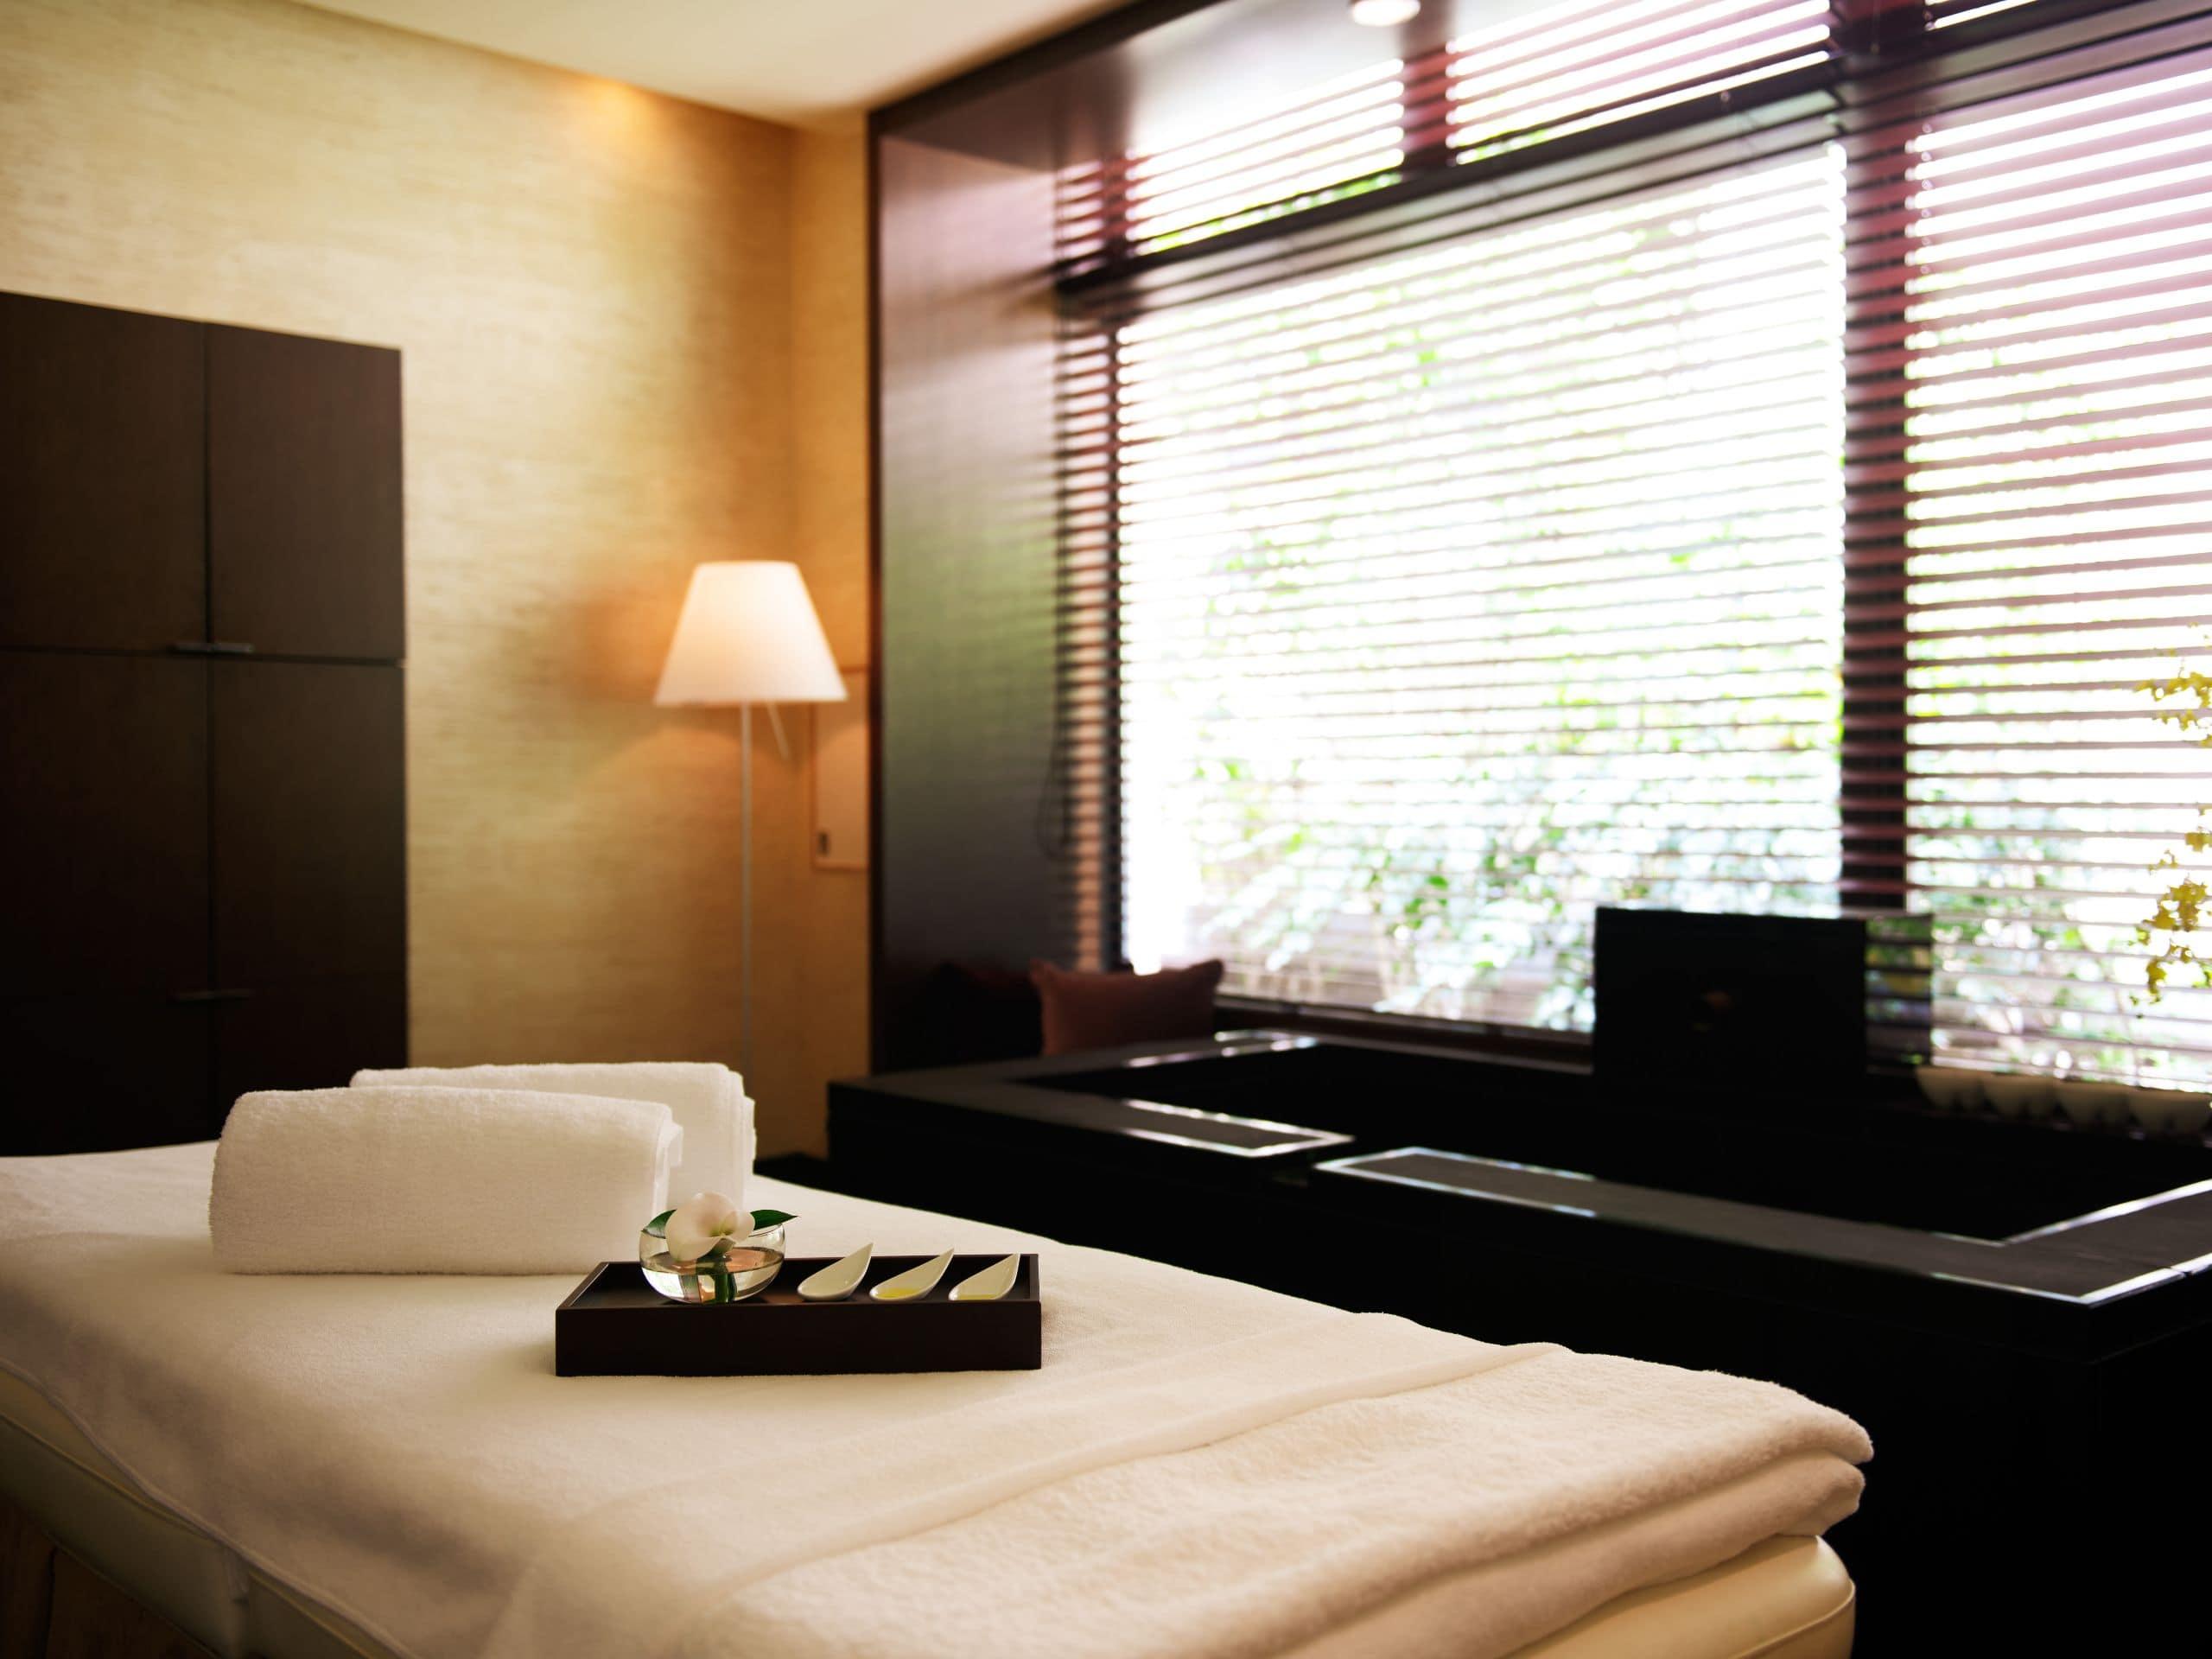 Hyatt Regency Hakone  Resot &  Spa   Spa IZUMI treatment room